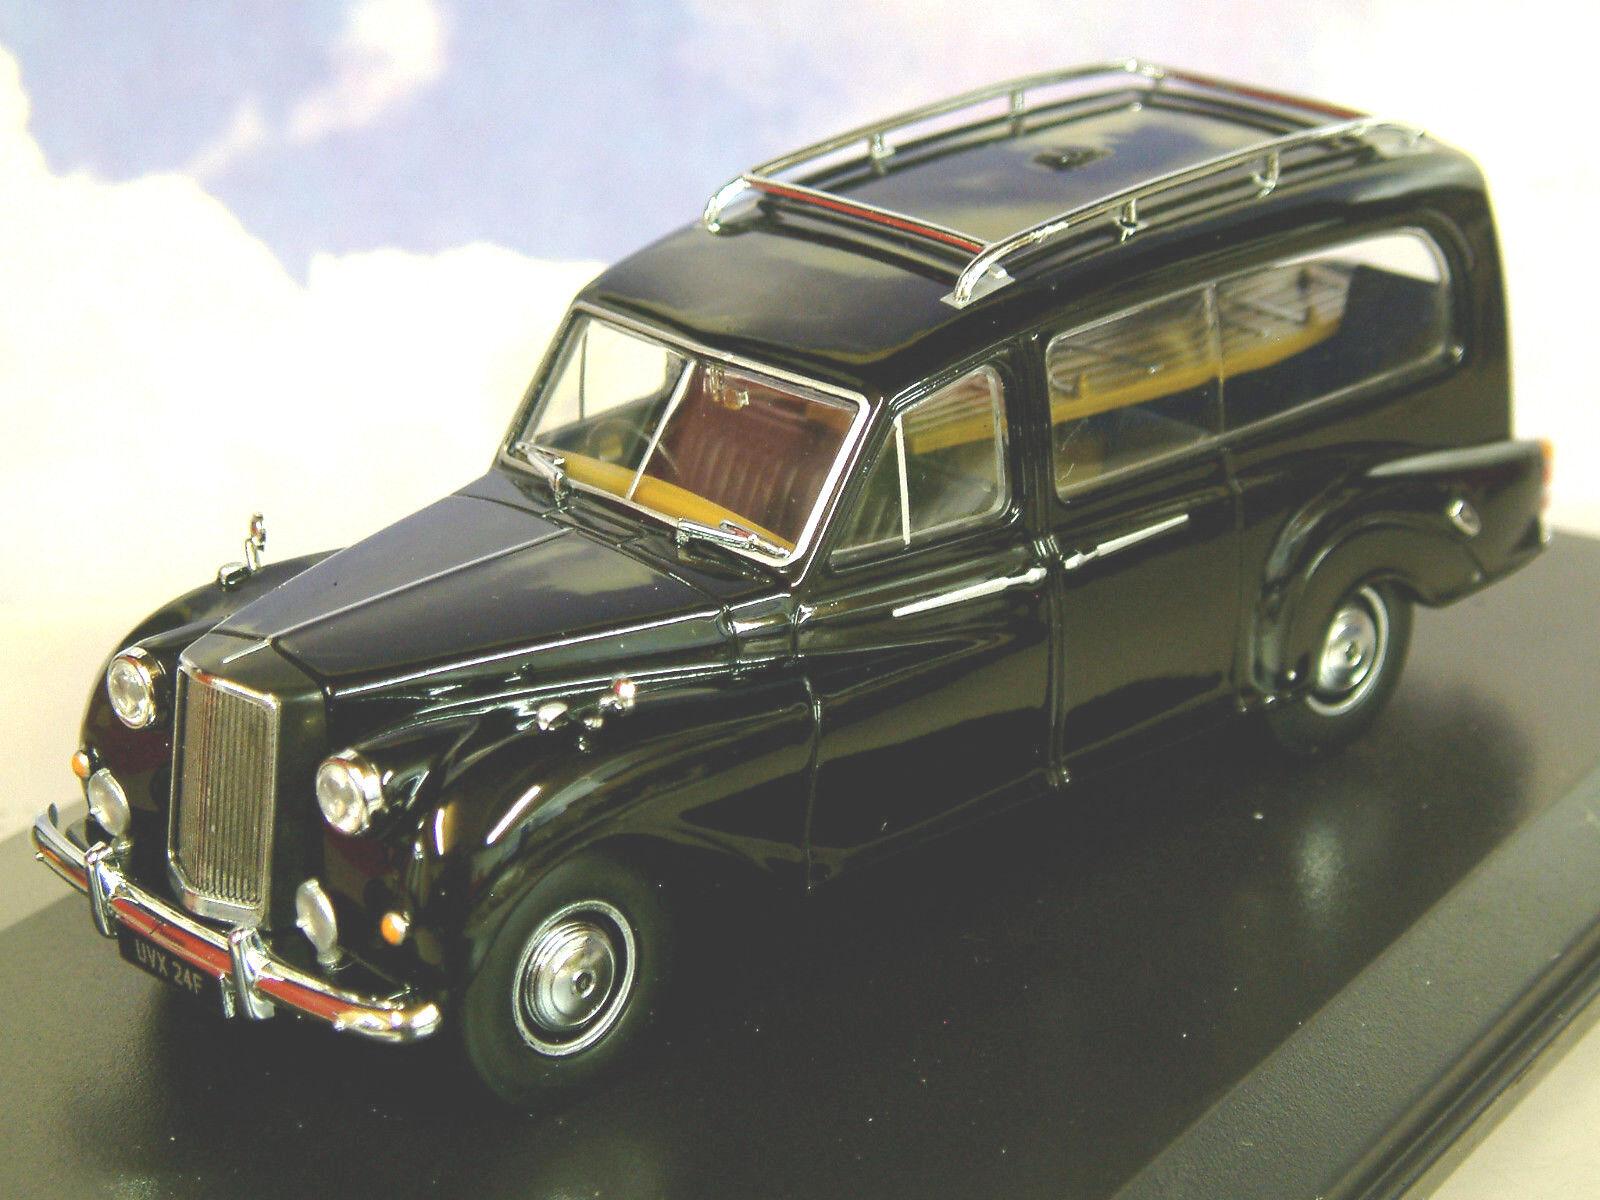 Superbe Oxford Diecast 1 43 Austin Princesse Corbillard Funérailles en black